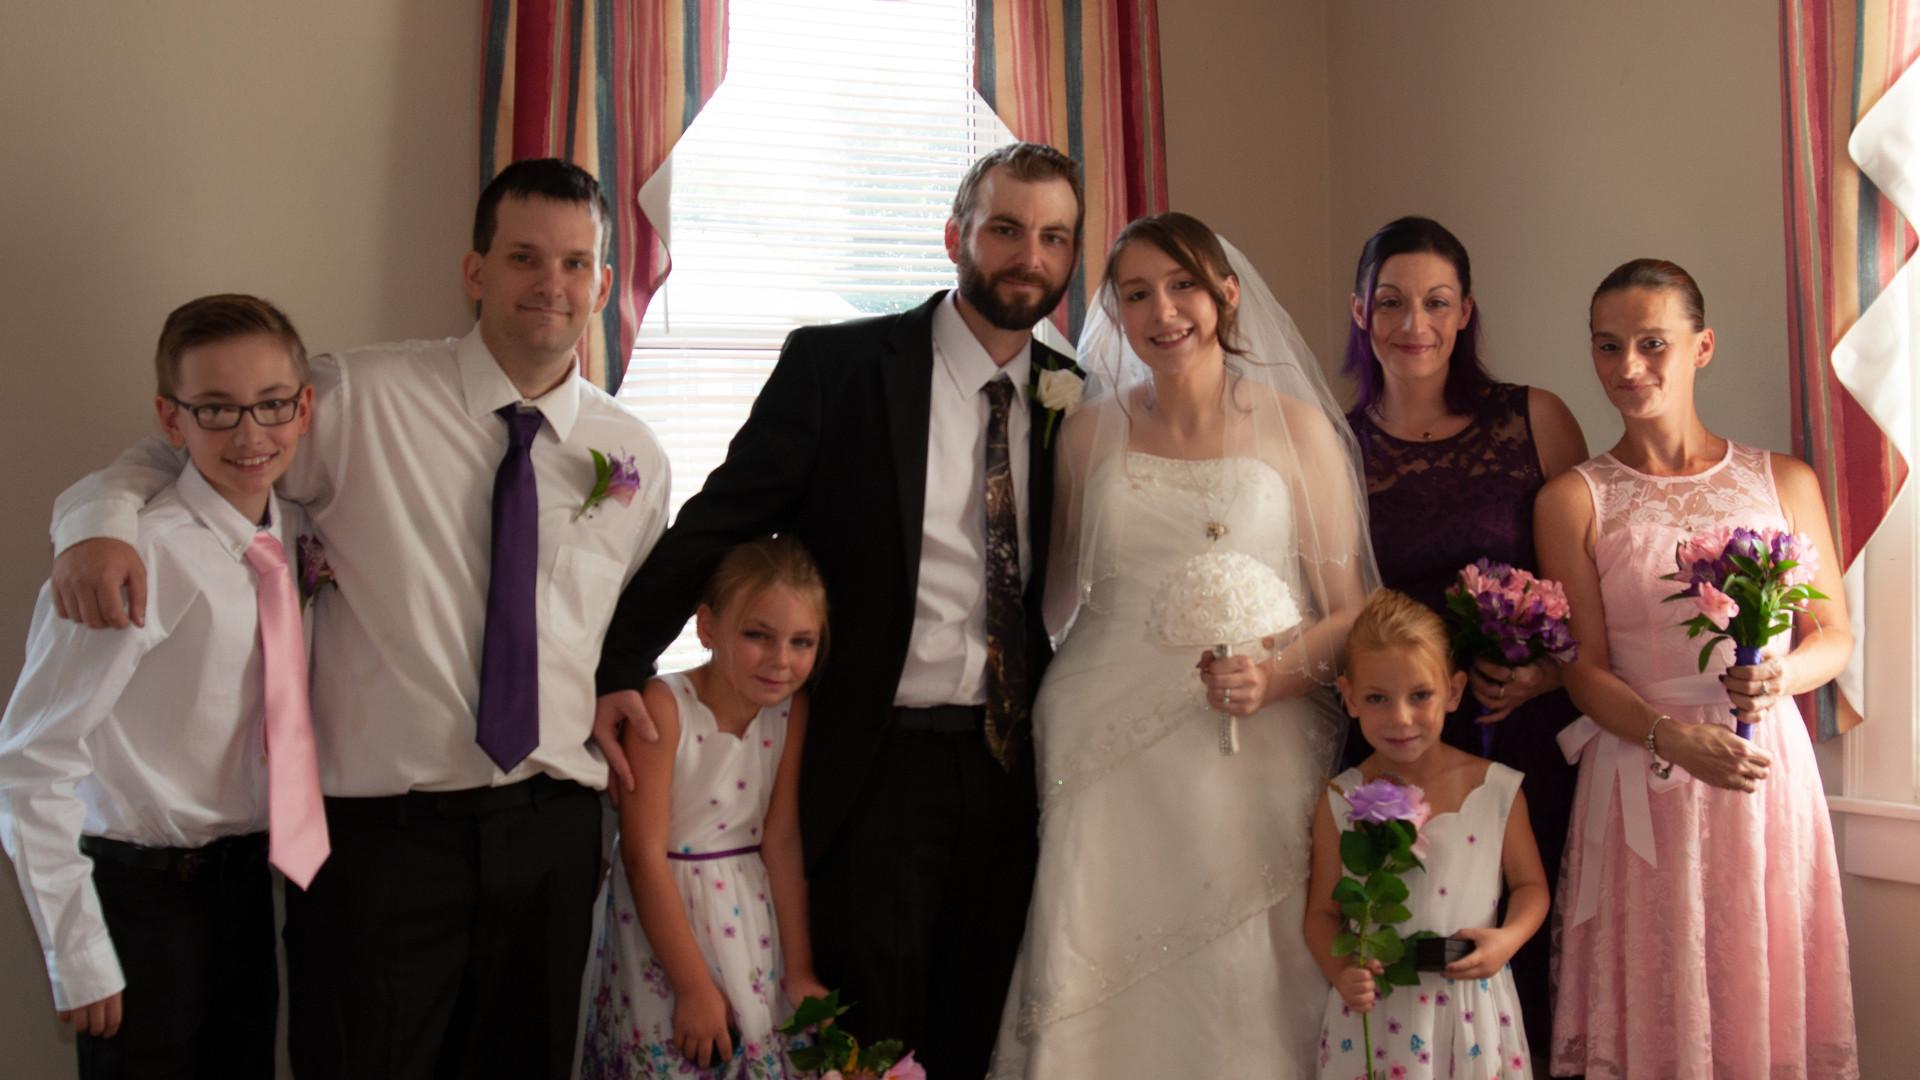 Whole Family Pose